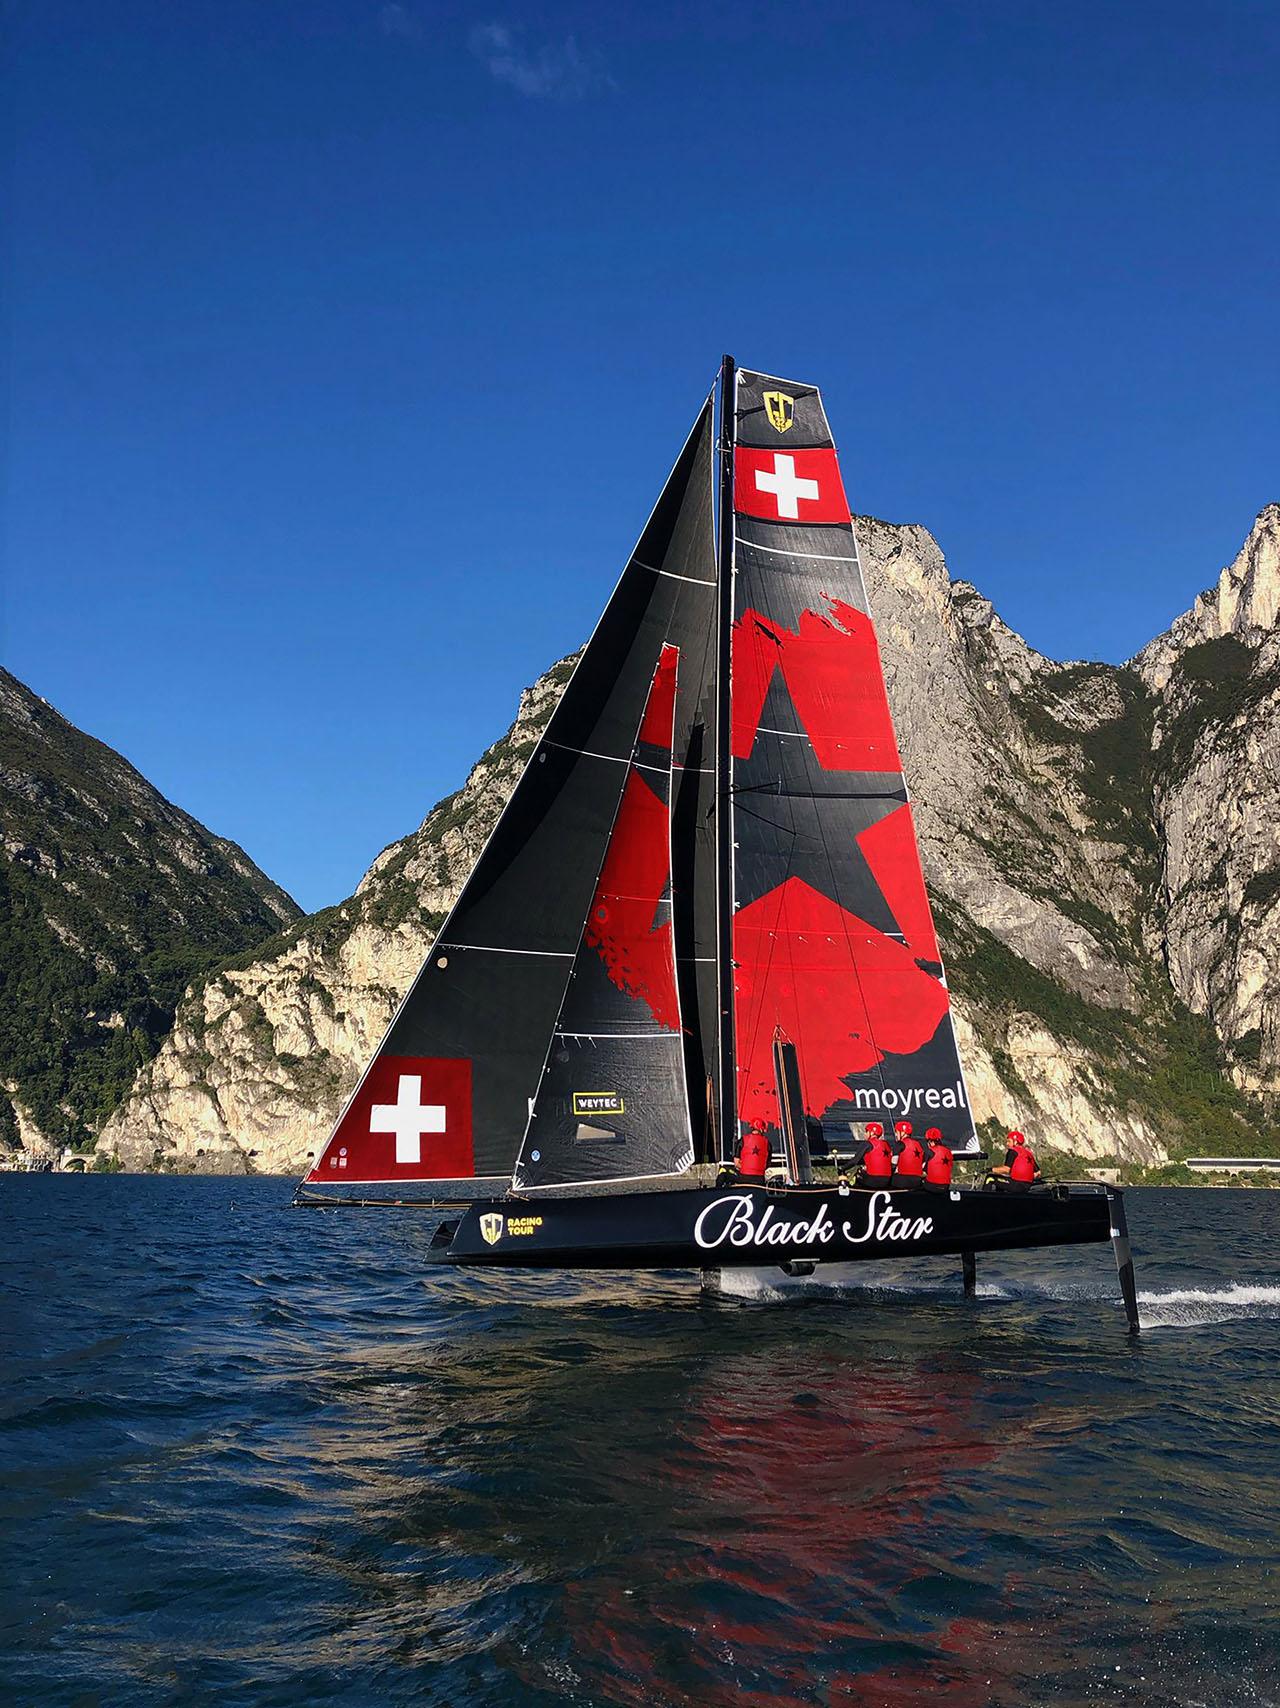 Black Star Sailing GC32 hydrofoil catamaran